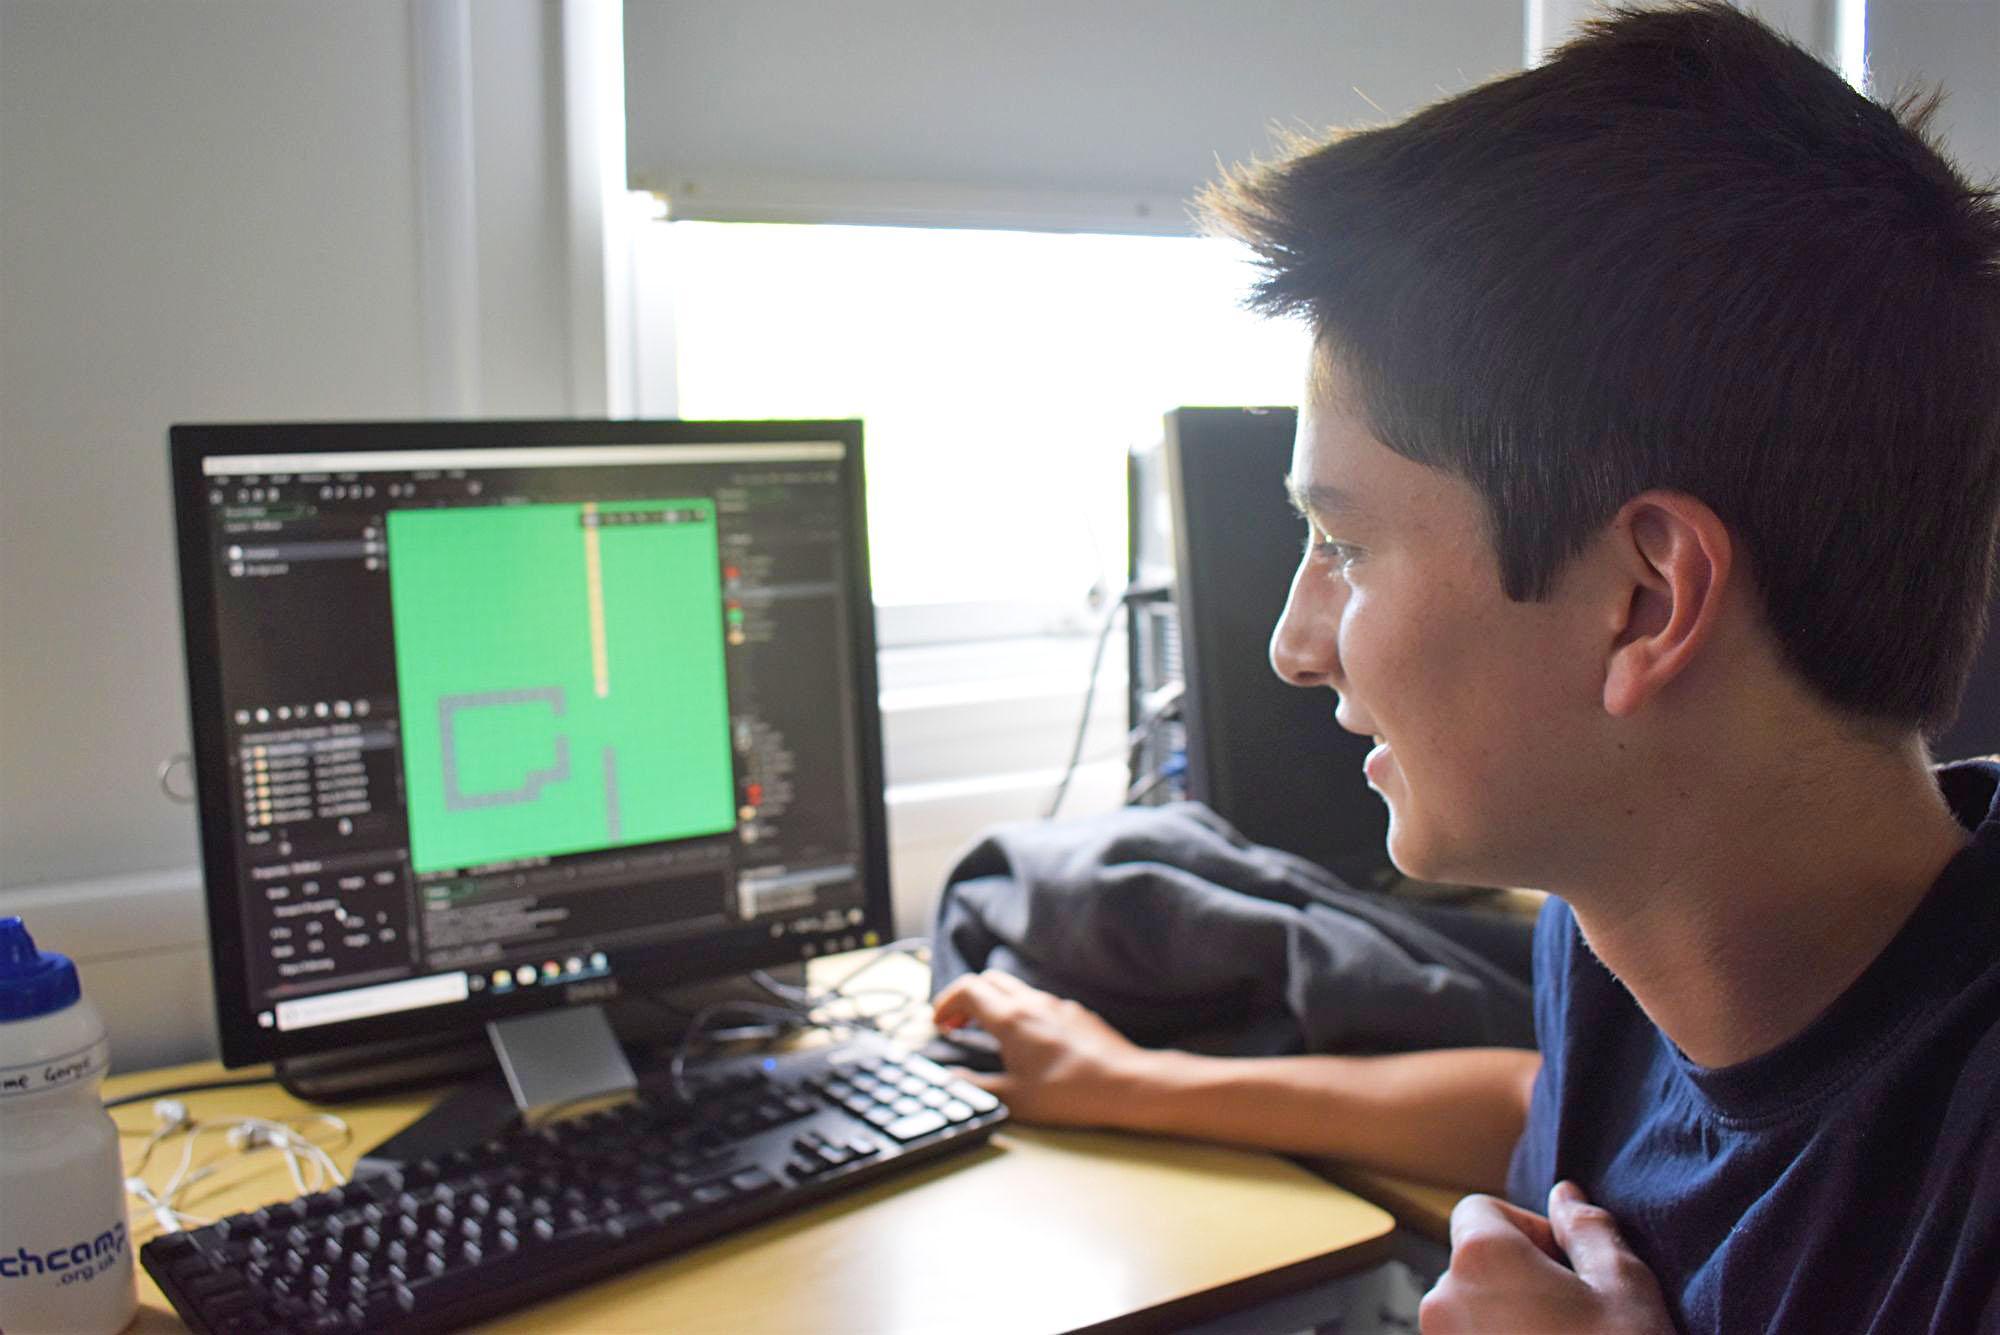 Teen boy looking at 3D printer